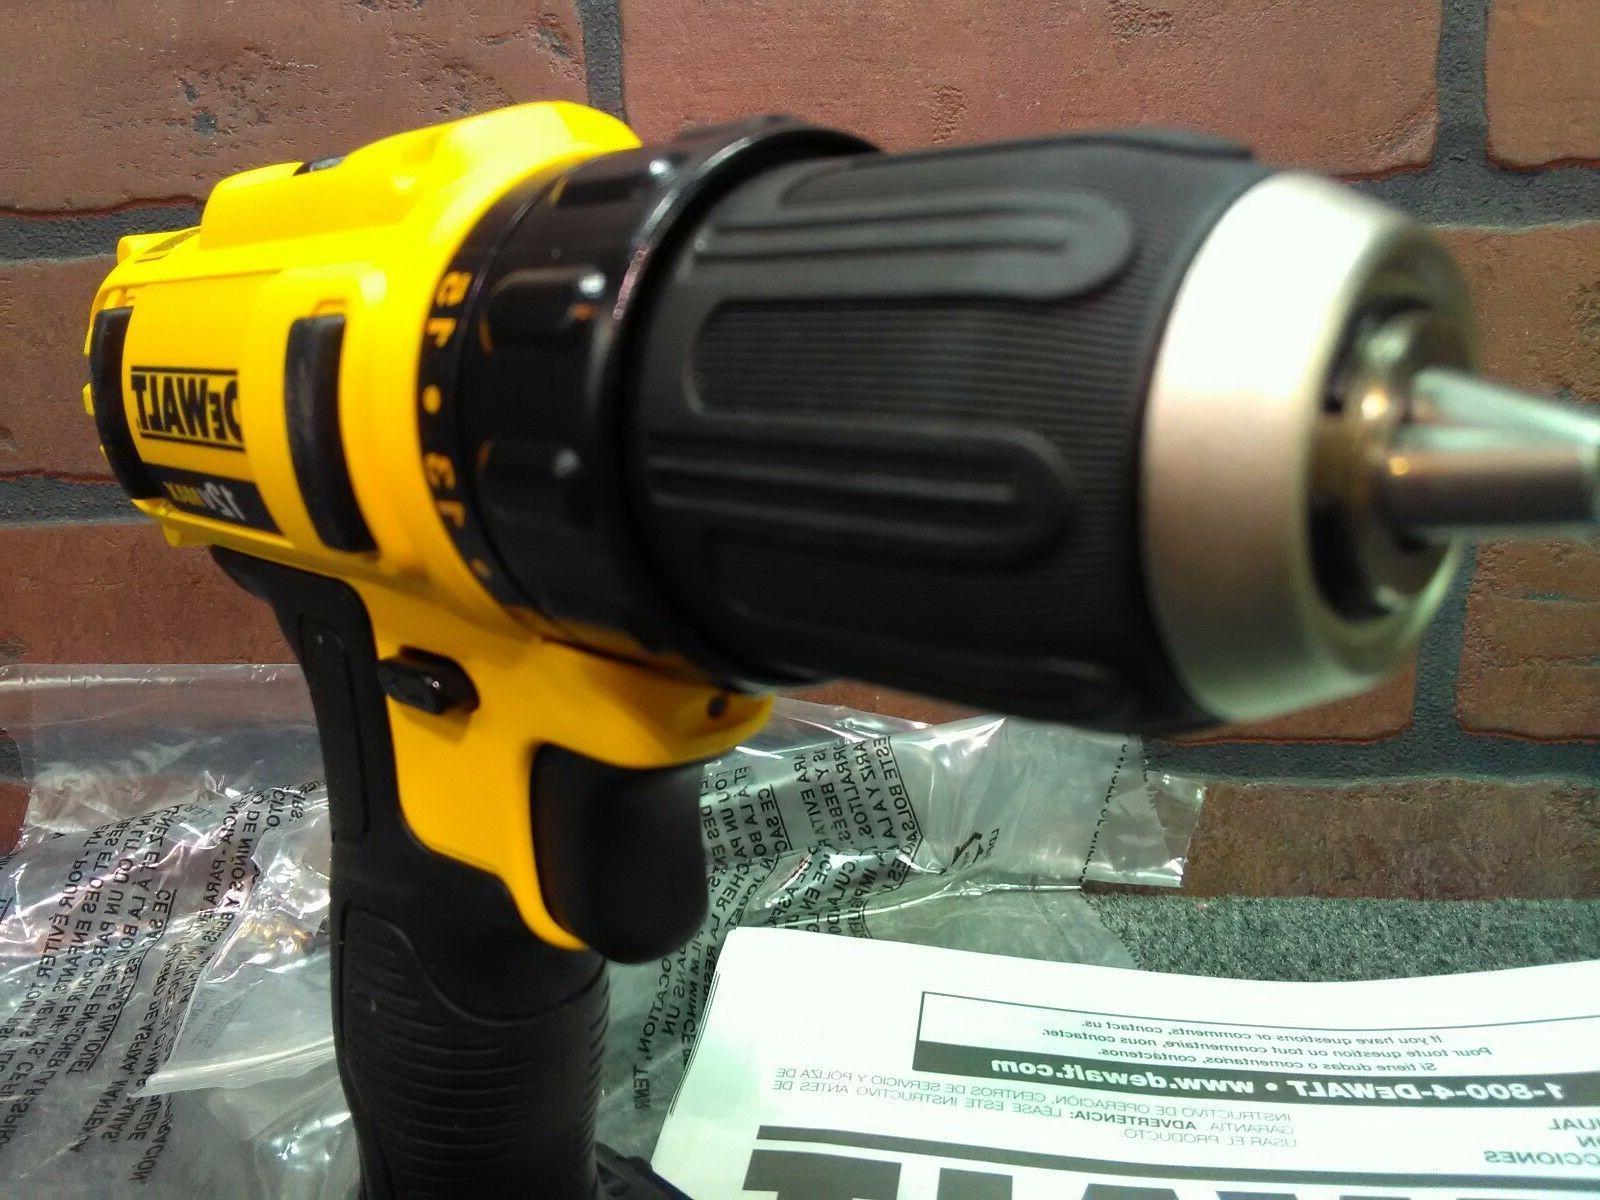 Dewalt 12V Cordless Drill Driver